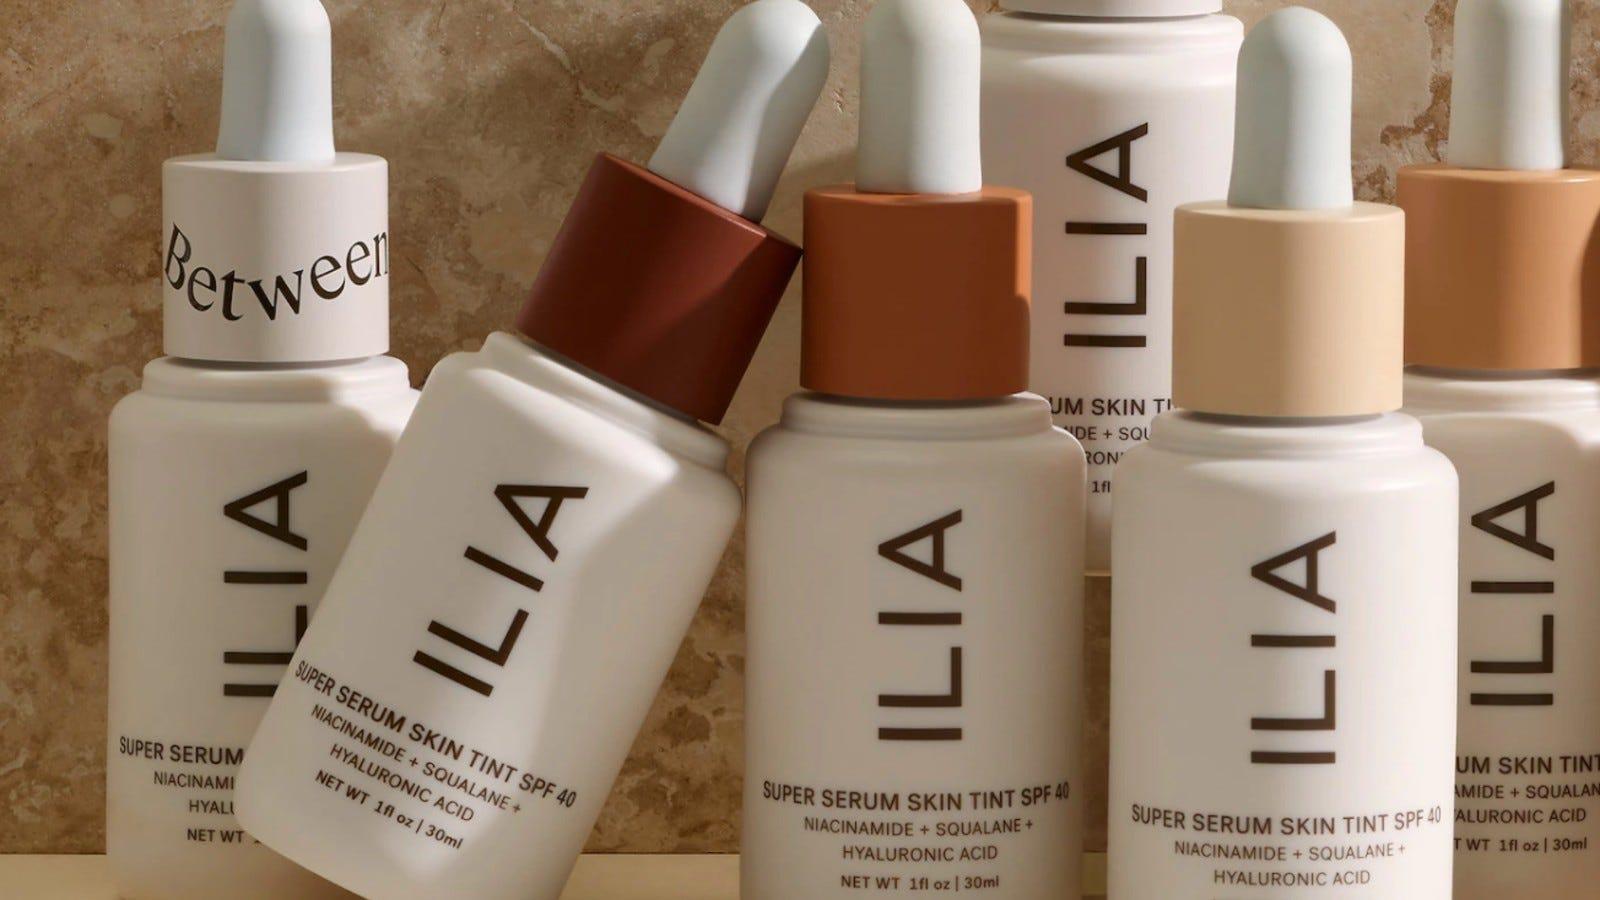 white bottles of Ilia Skin Serum in various shades